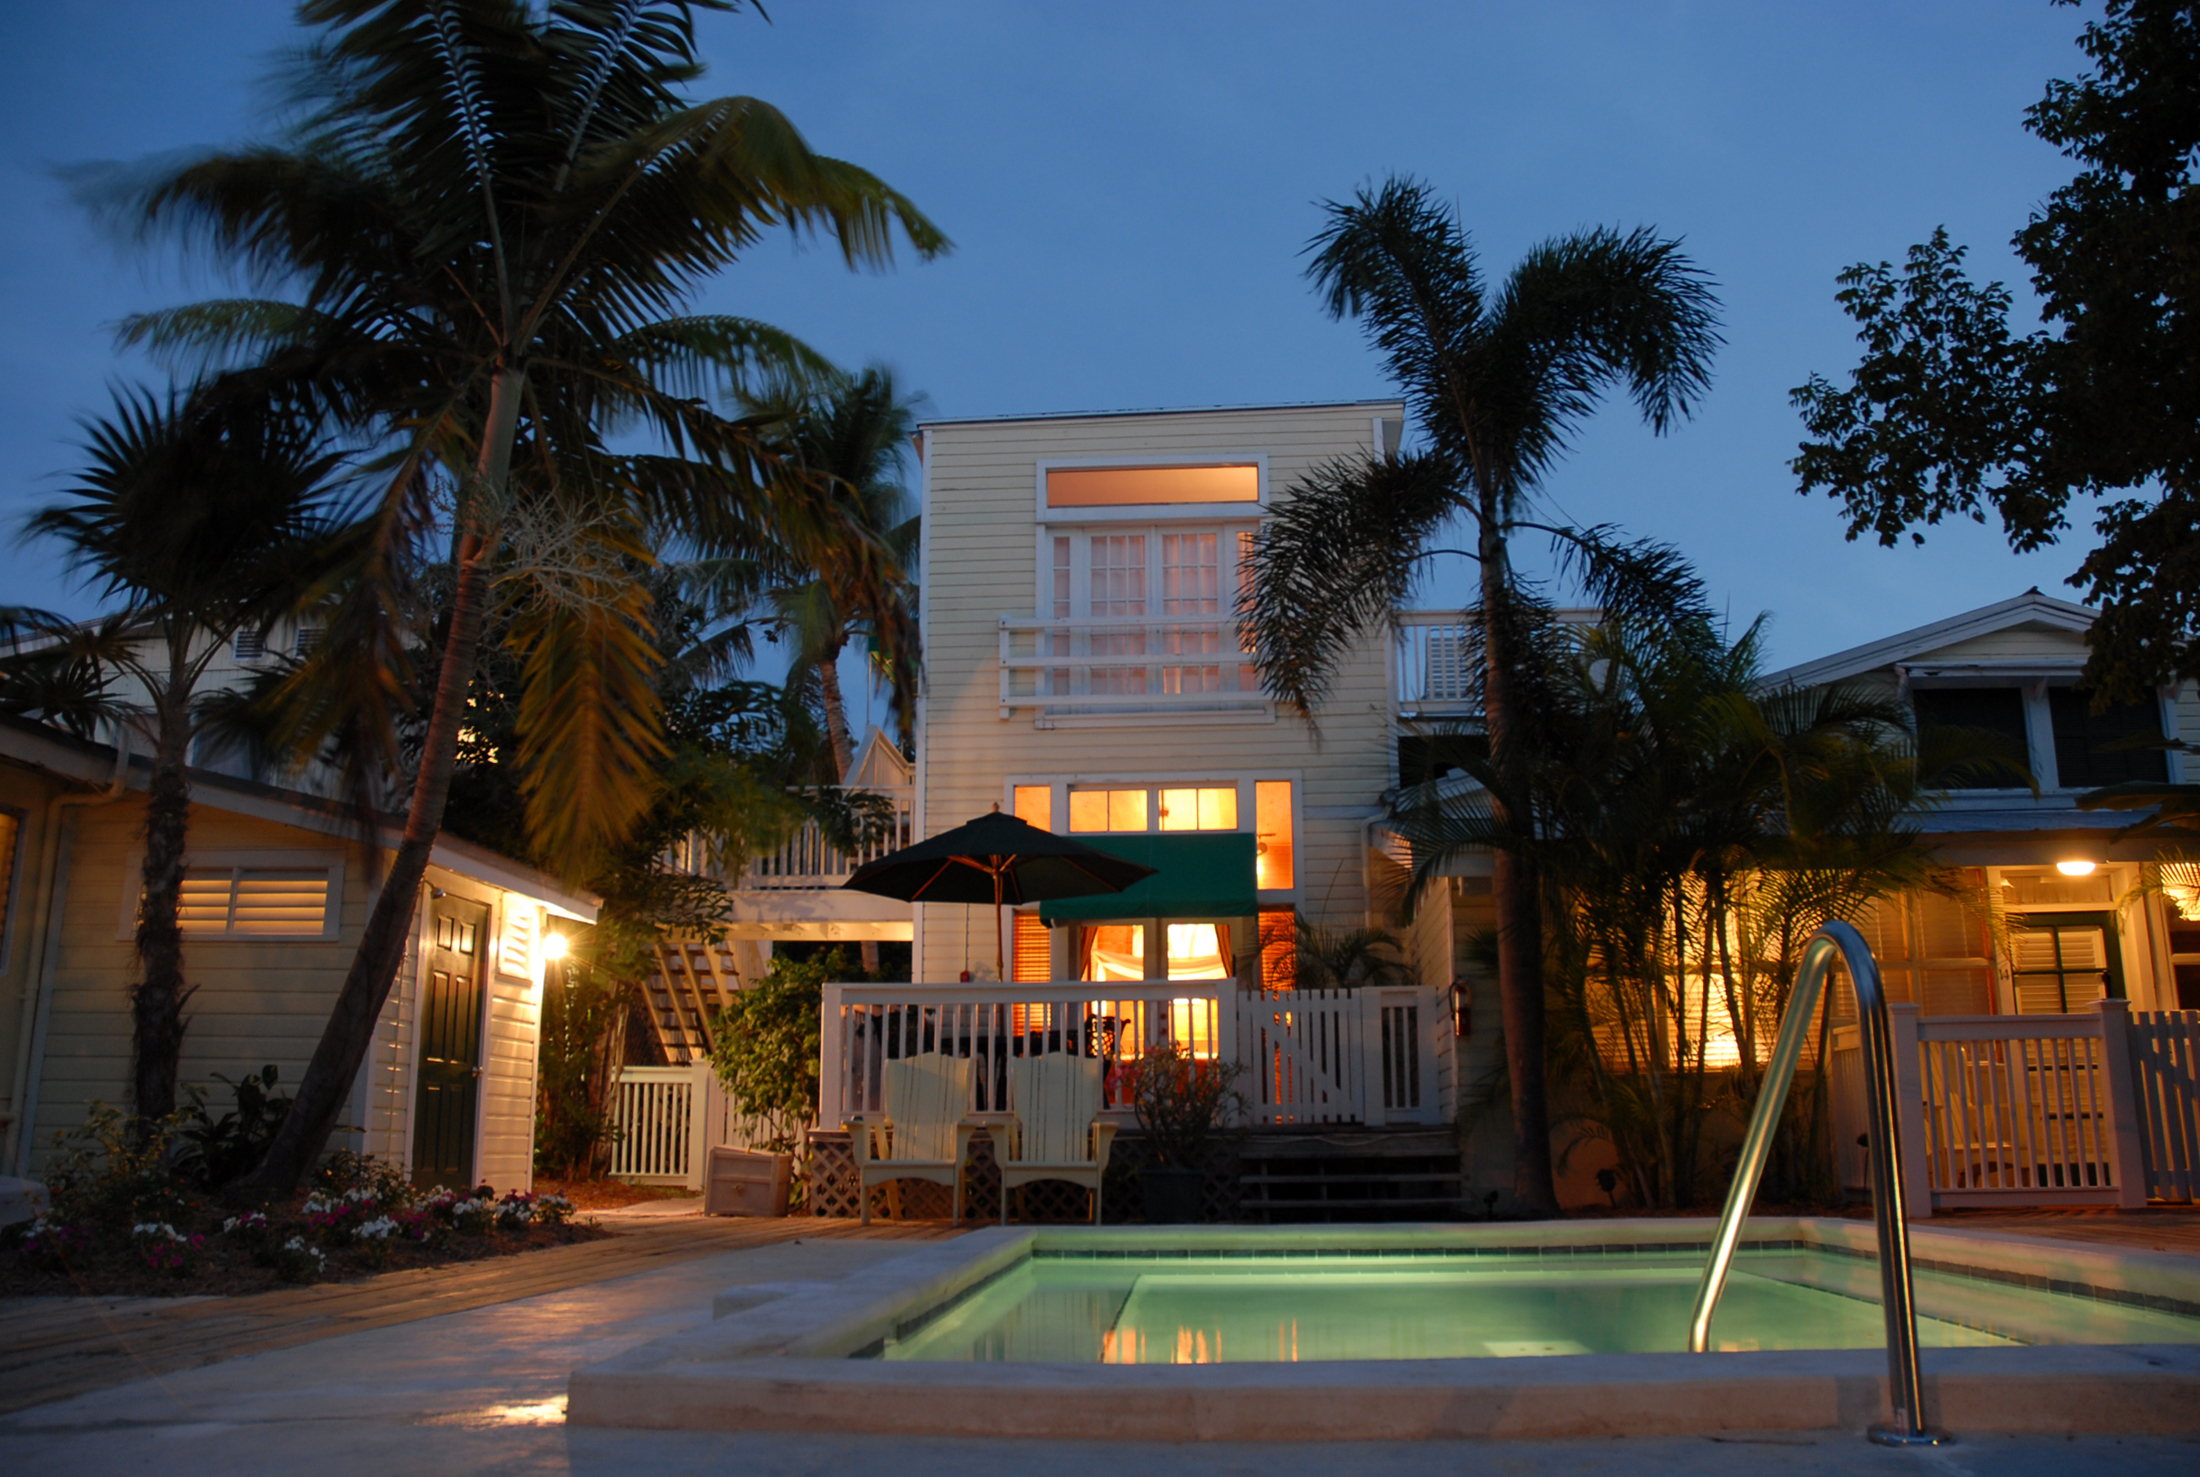 Merlin Guest House in Key West image 4